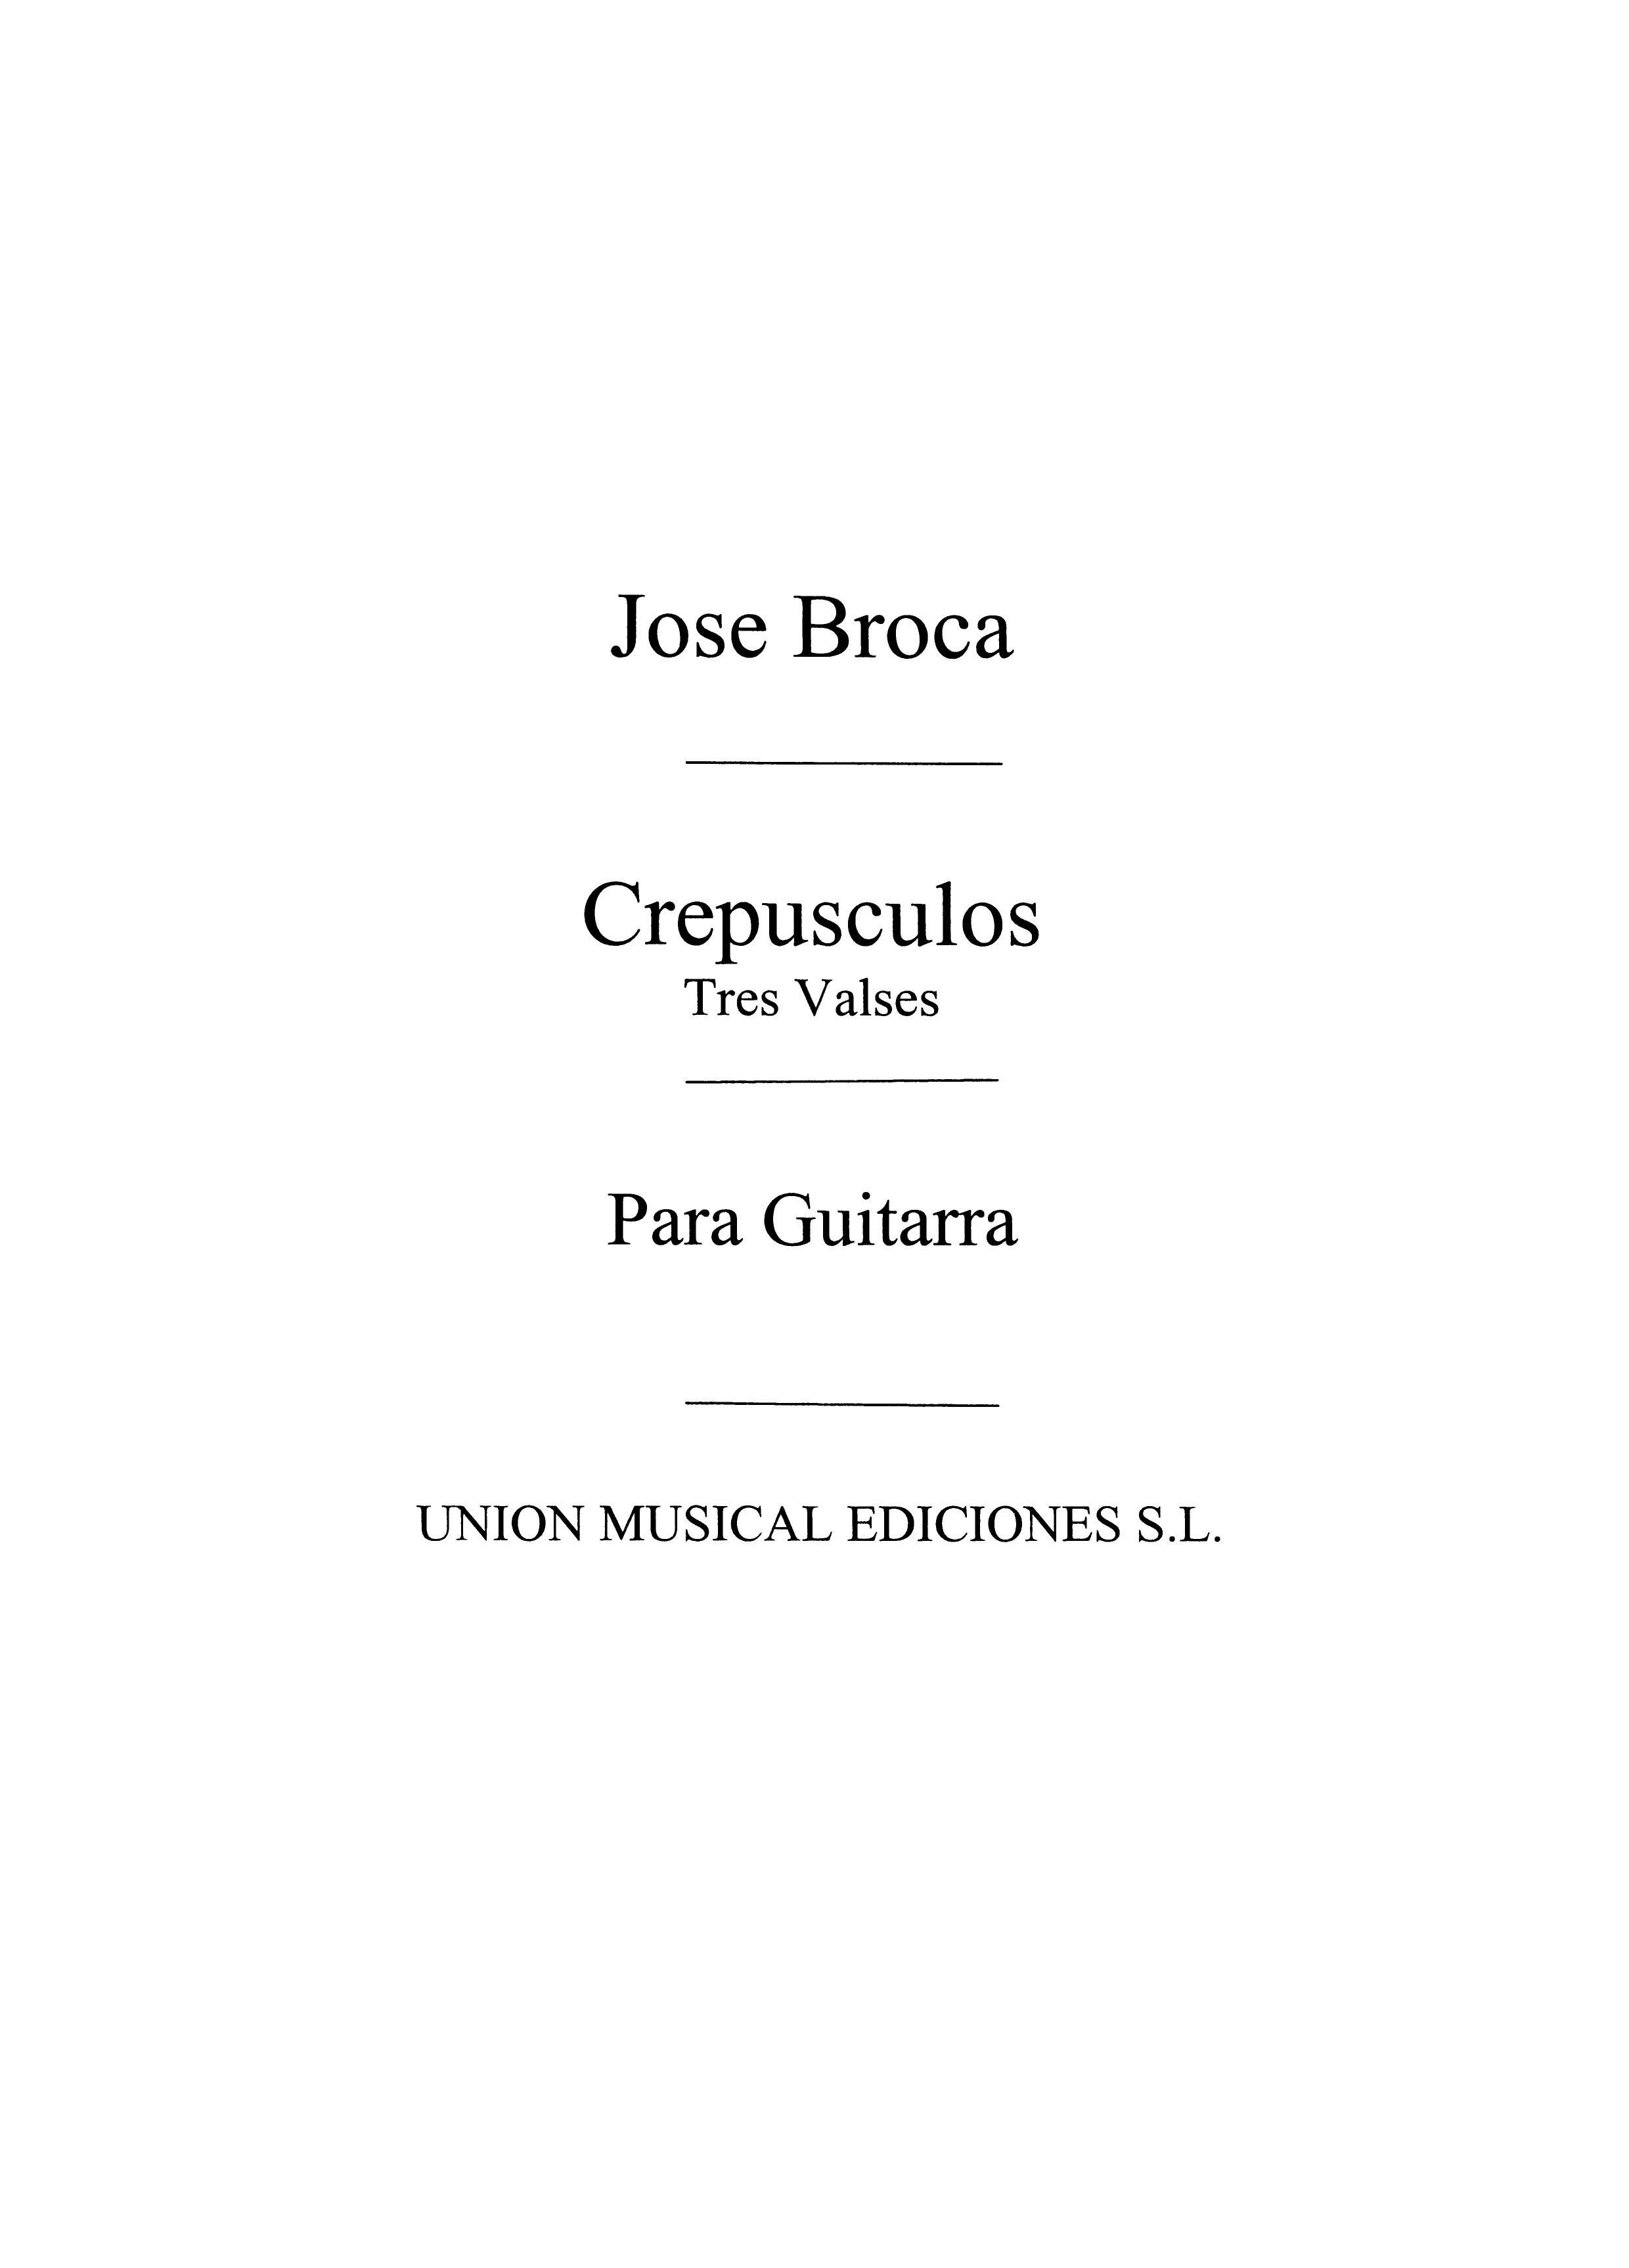 Jose Broca: Crepusculos  tres Valses: Guitar: Instrumental Work